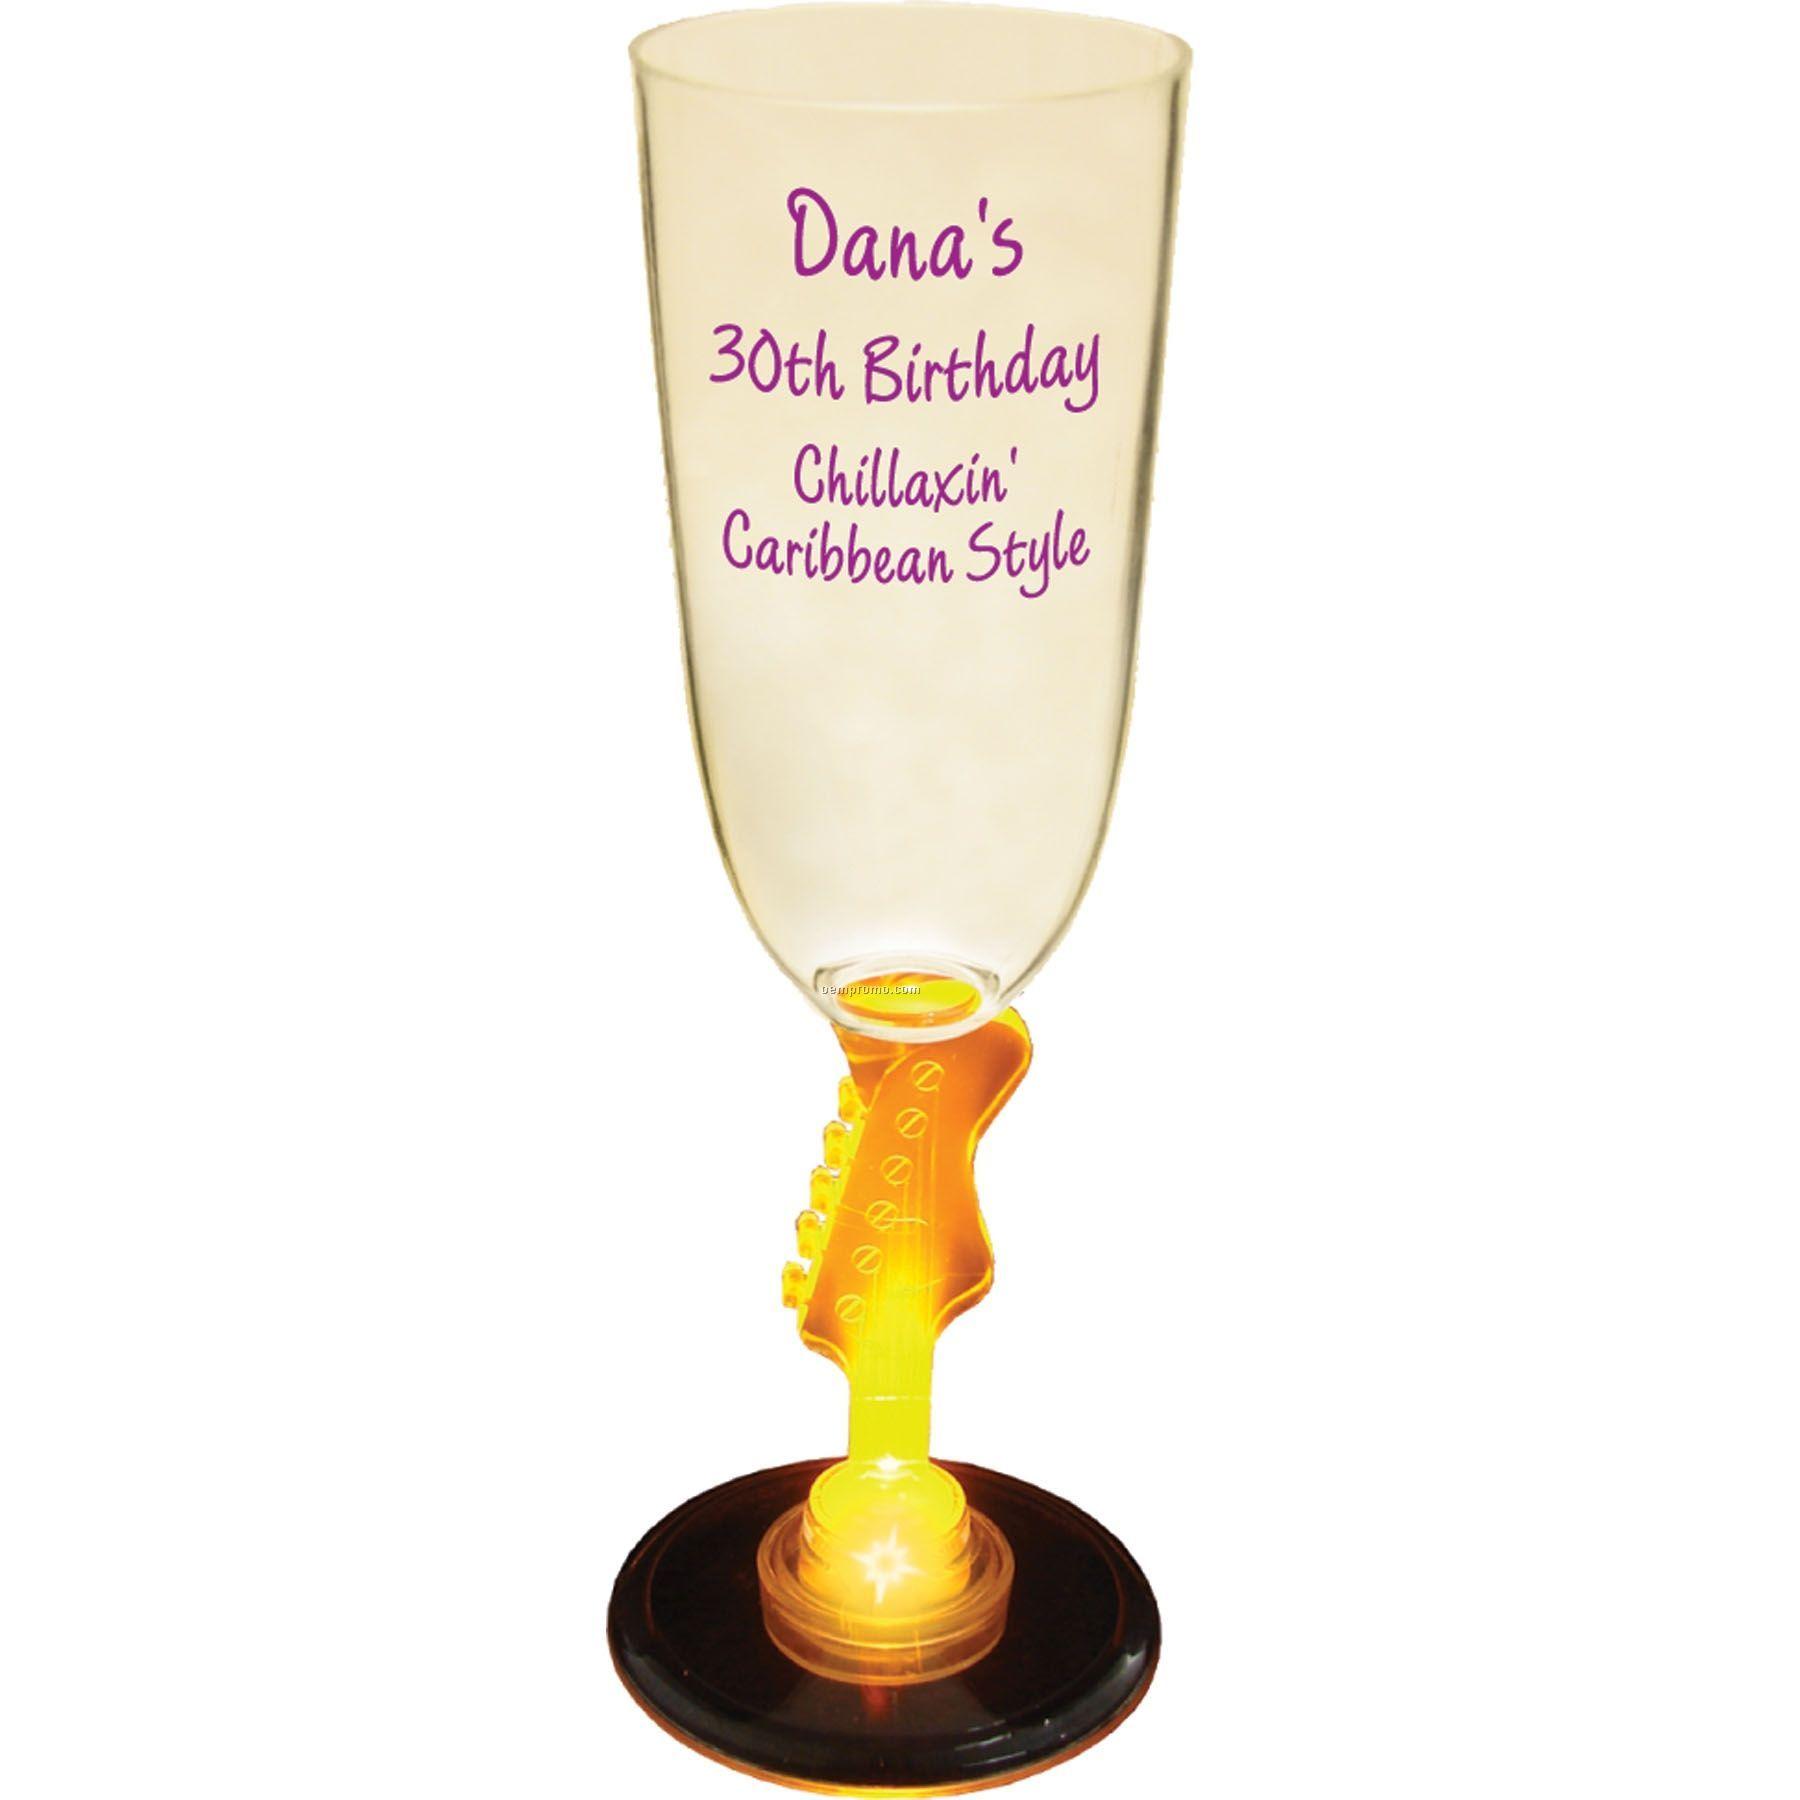 7 Oz. Lighted Novelty Stem Champagne